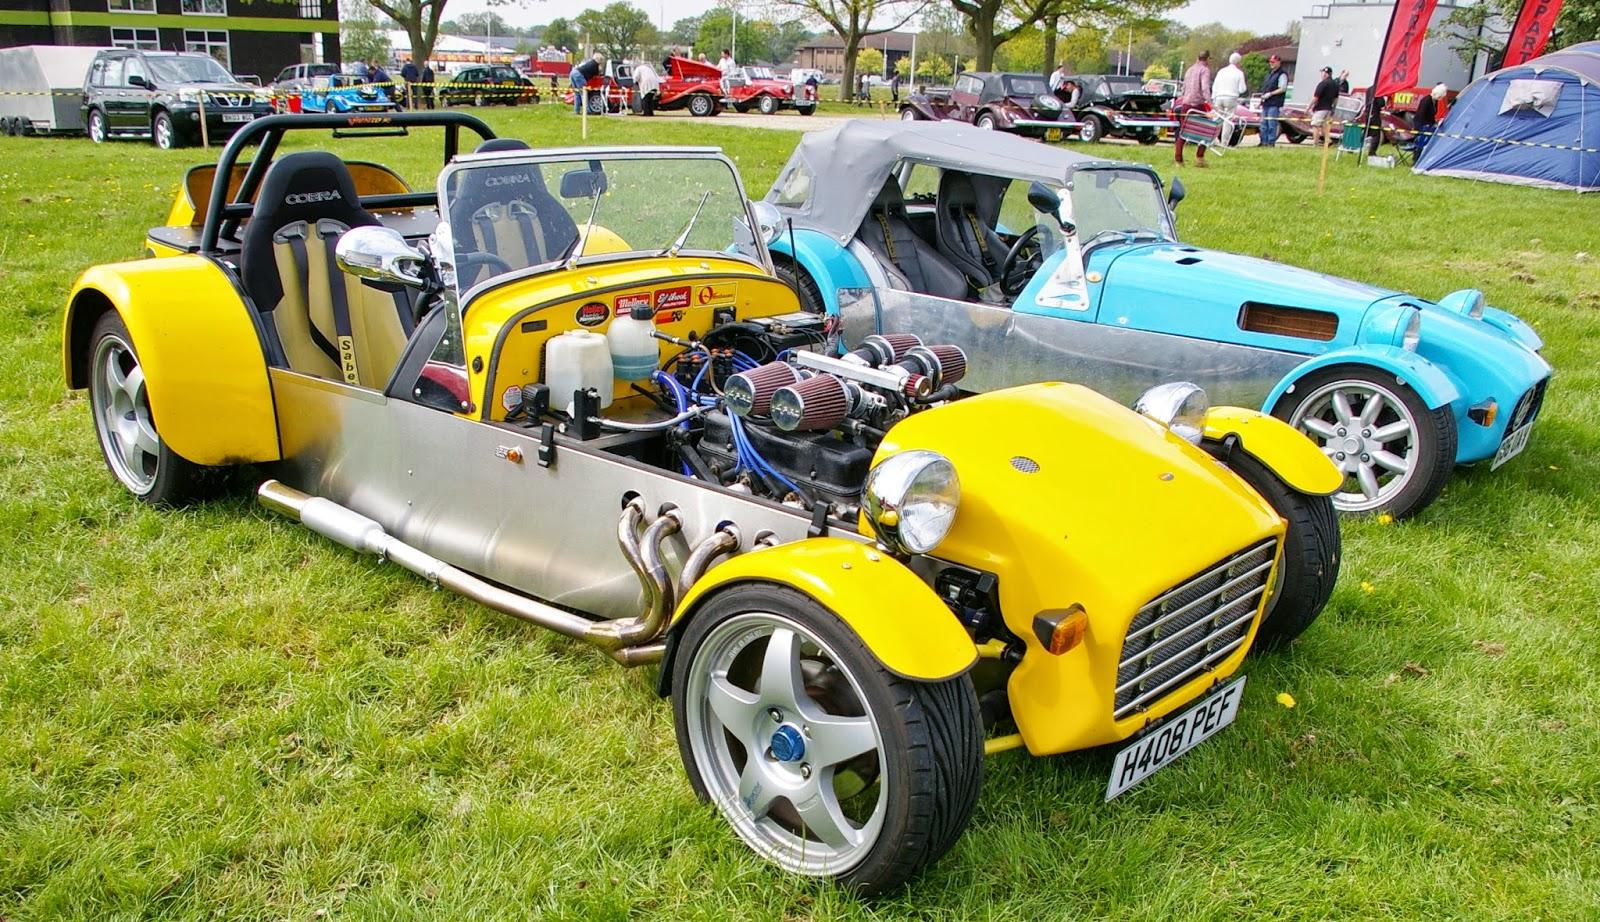 Kit Car Show Stoneleigh - Car shows near me